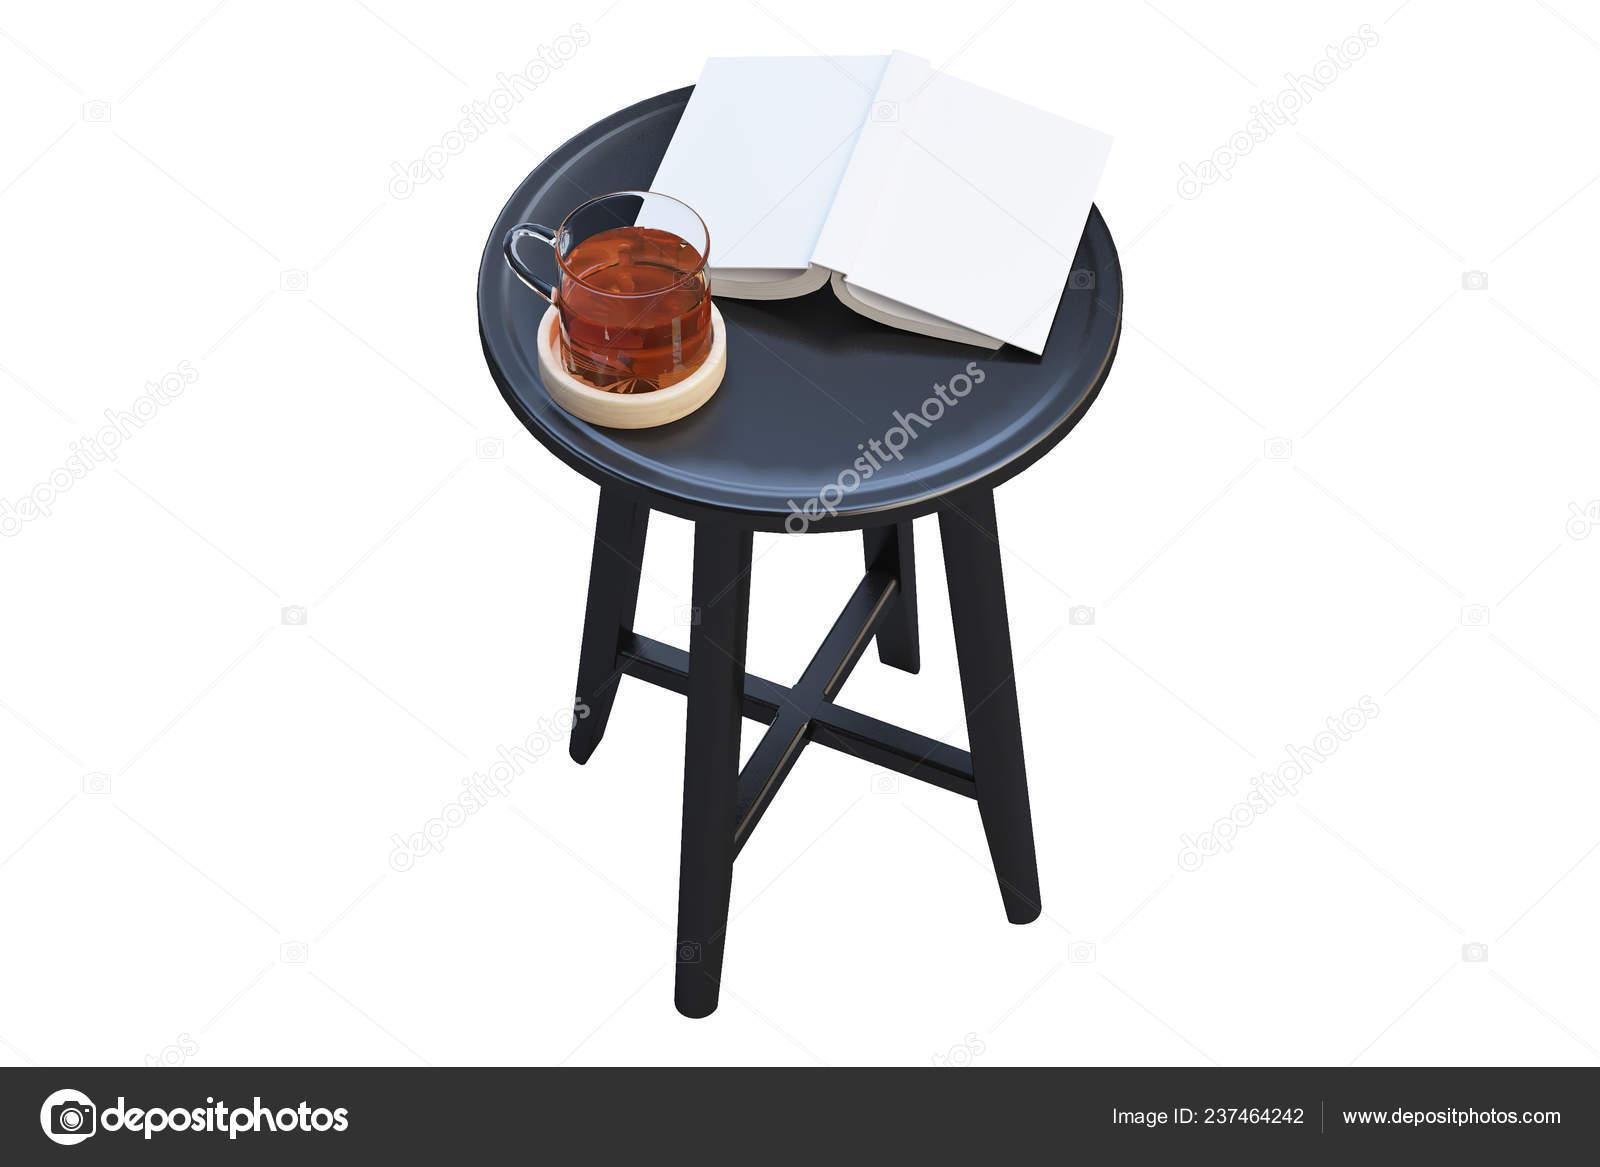 Picture of: Modern Black Coffee Table Books Thin Legs White Background Render Stock Photo C 3dmitruk 237464242